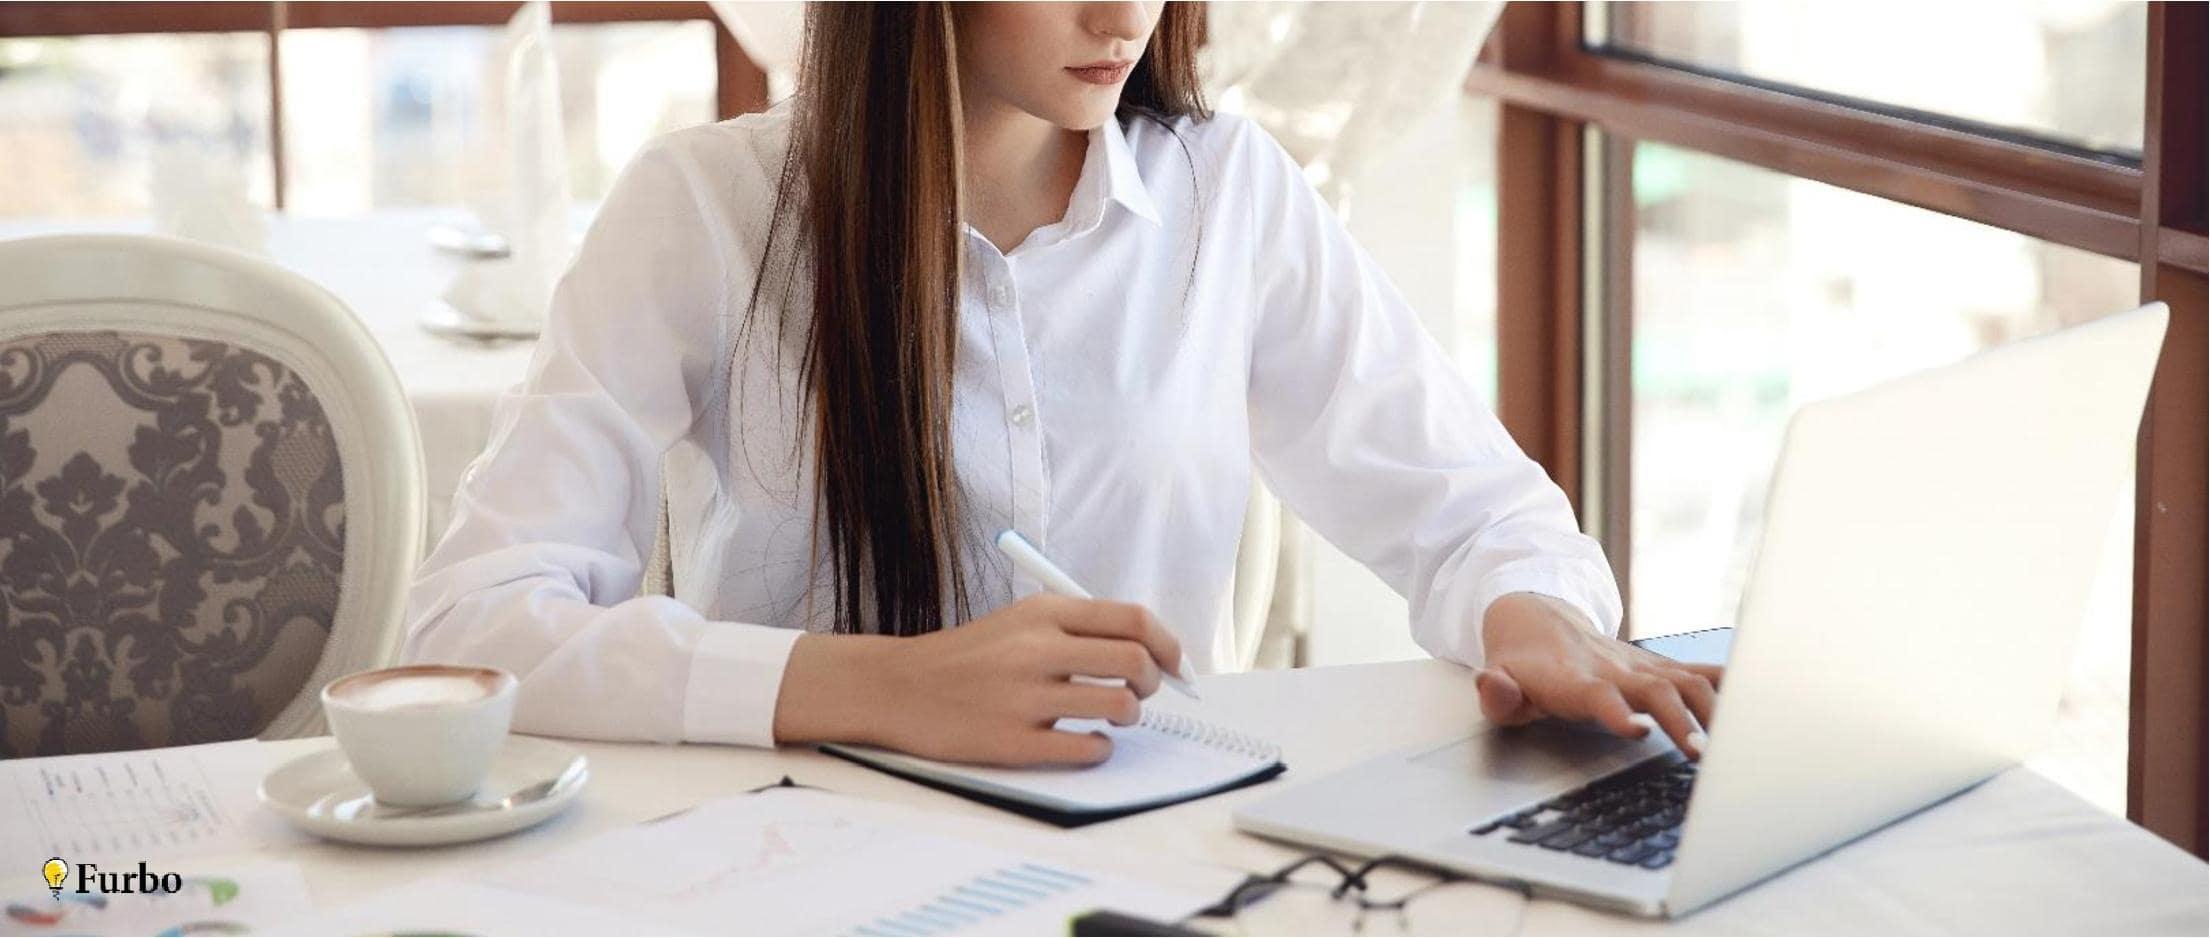 چگونه کتاب الکترونیک بنویسم و منتشر کنیم؟